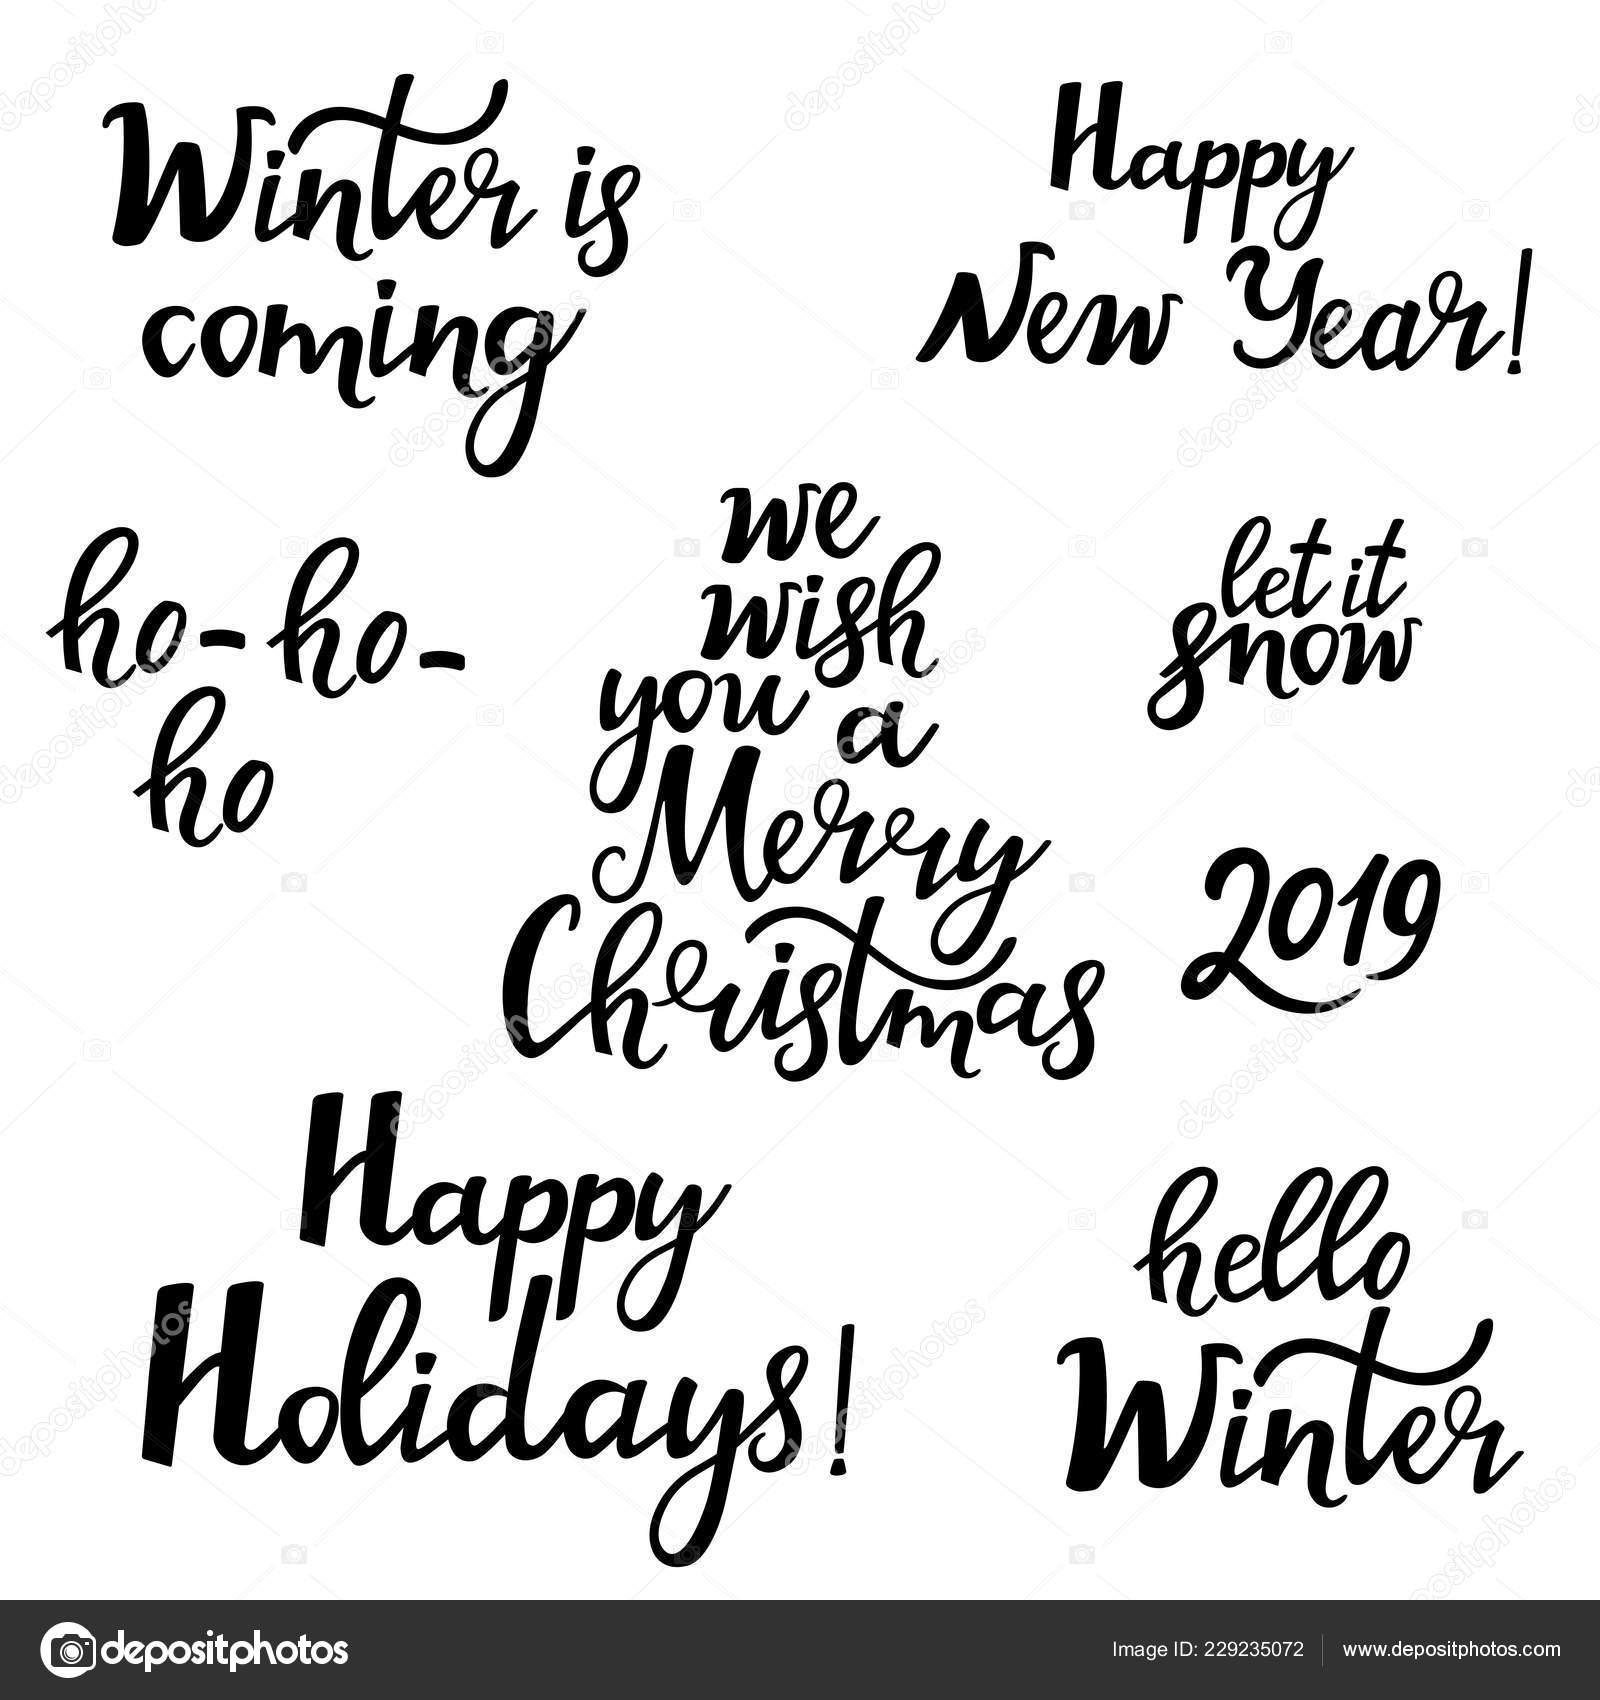 Feliz Natal Feliz Ano Novo 2019 Olá Inverno Conjunto Frases